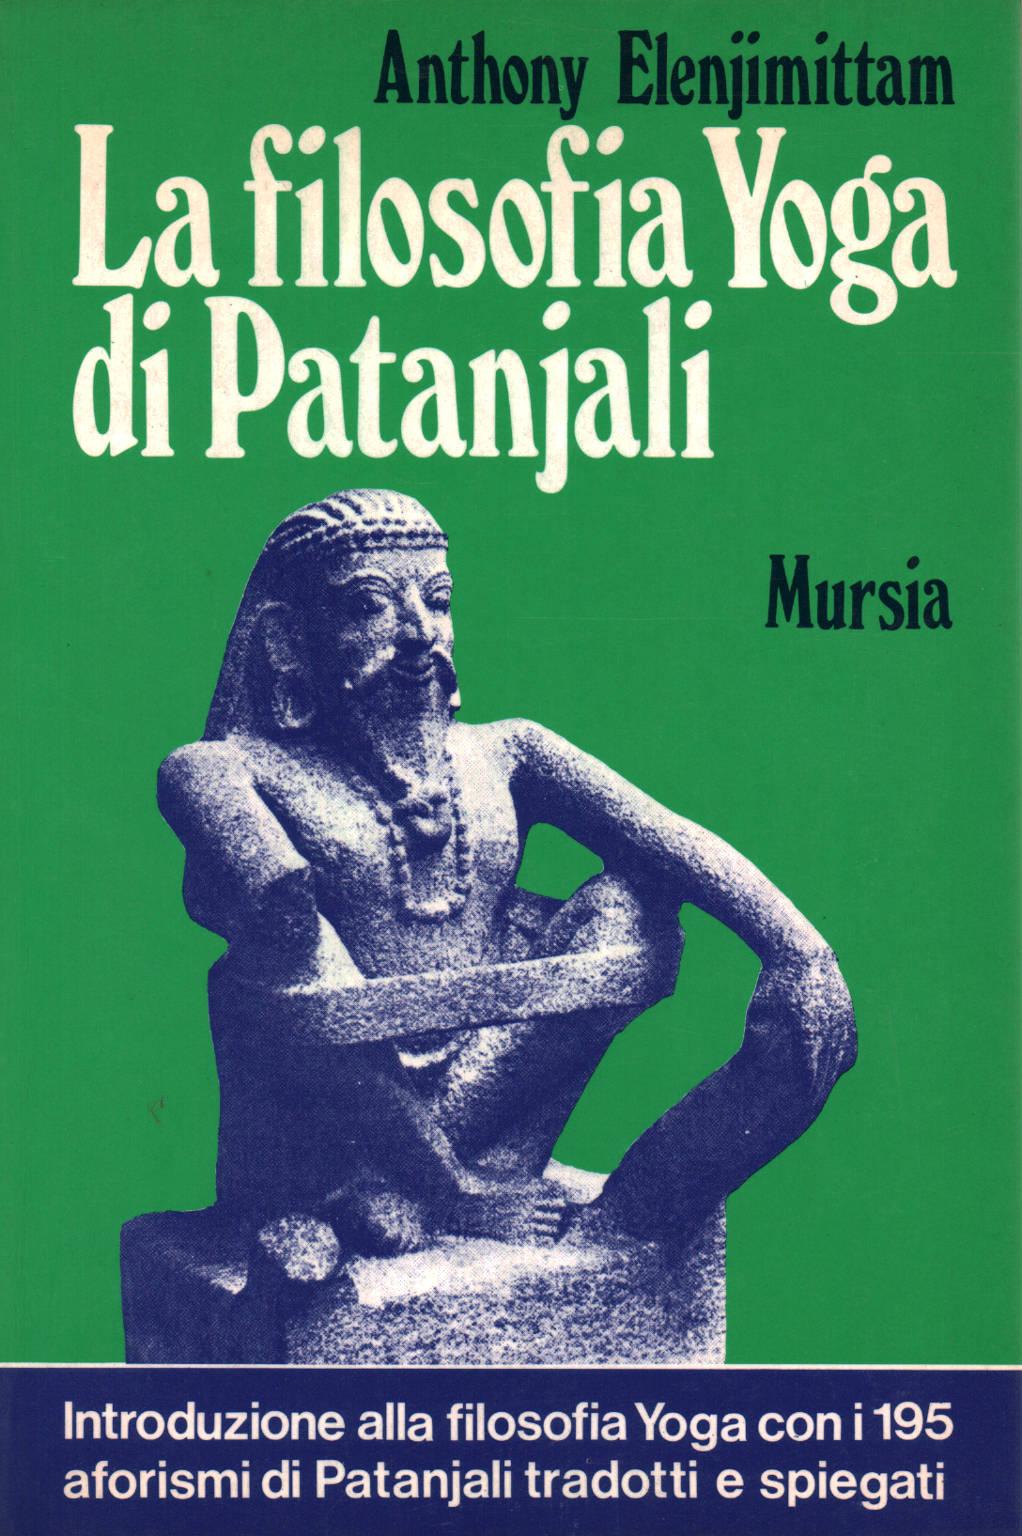 The Yoga Philosophy Of Patanjali Anthony Elenjimittam Manualistica Varia Manuals Library Dimanoinmano It